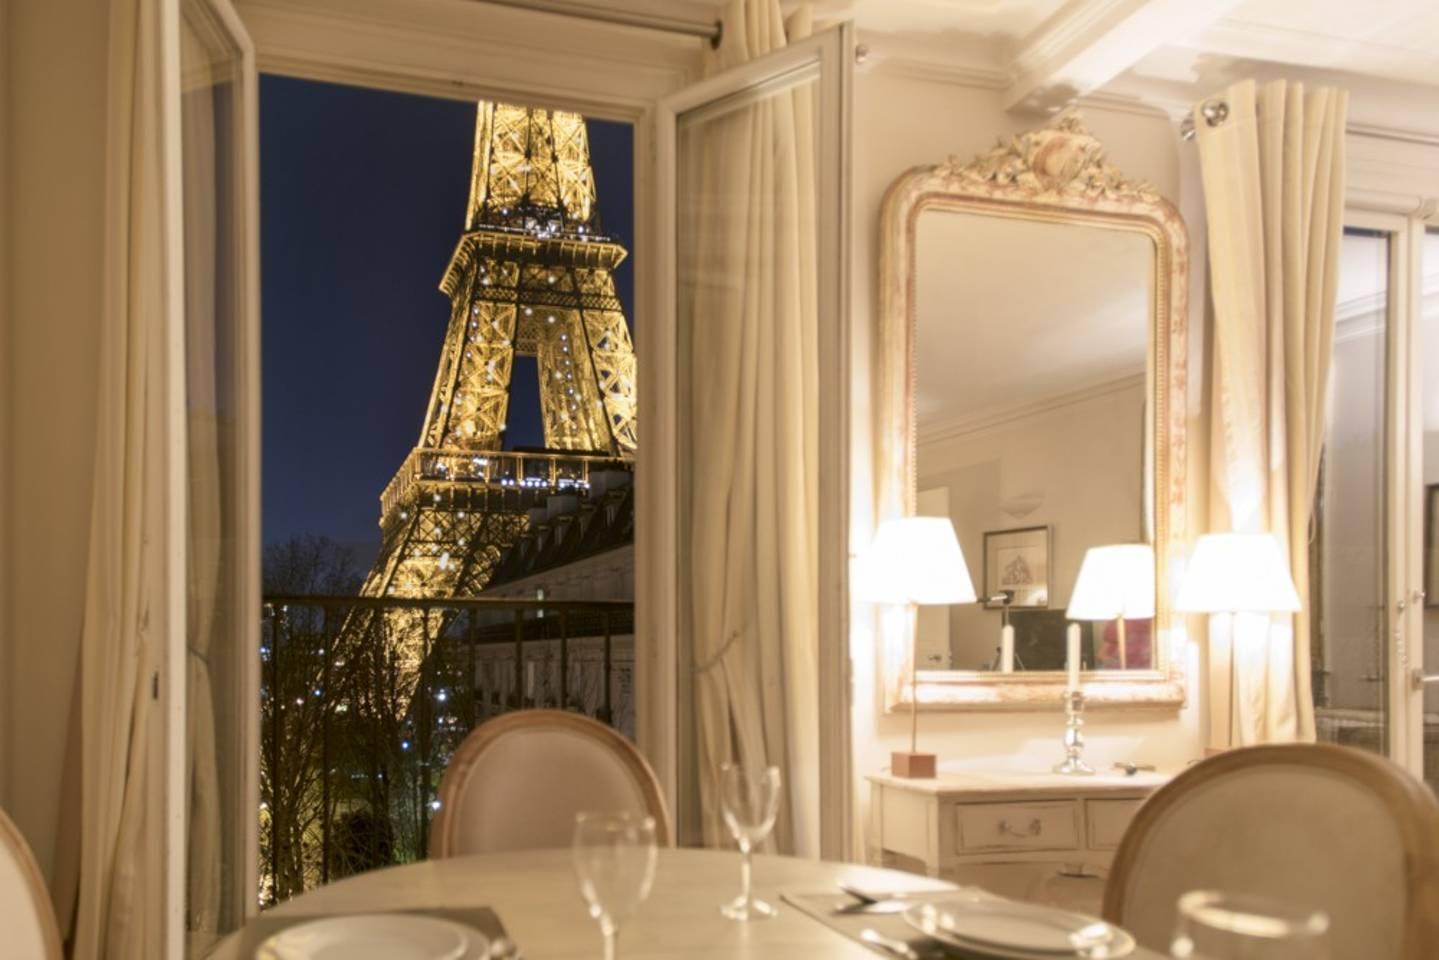 6/Paris apartment with a view